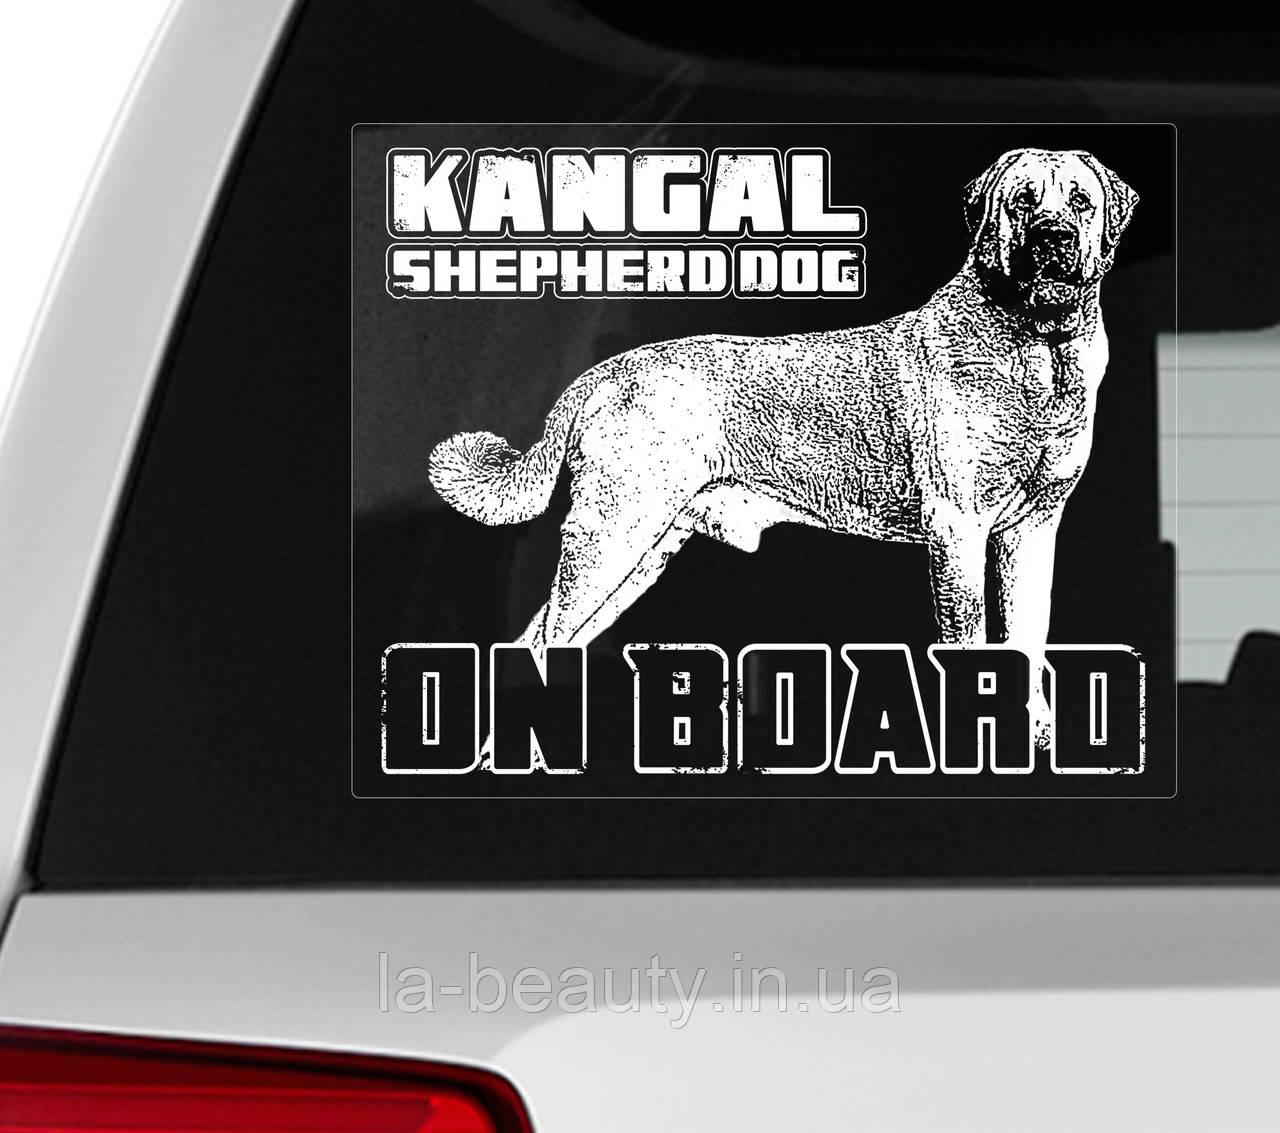 Наклейка на авто / машину Кангал на борту (Kangal Shepherd Dog On Board)